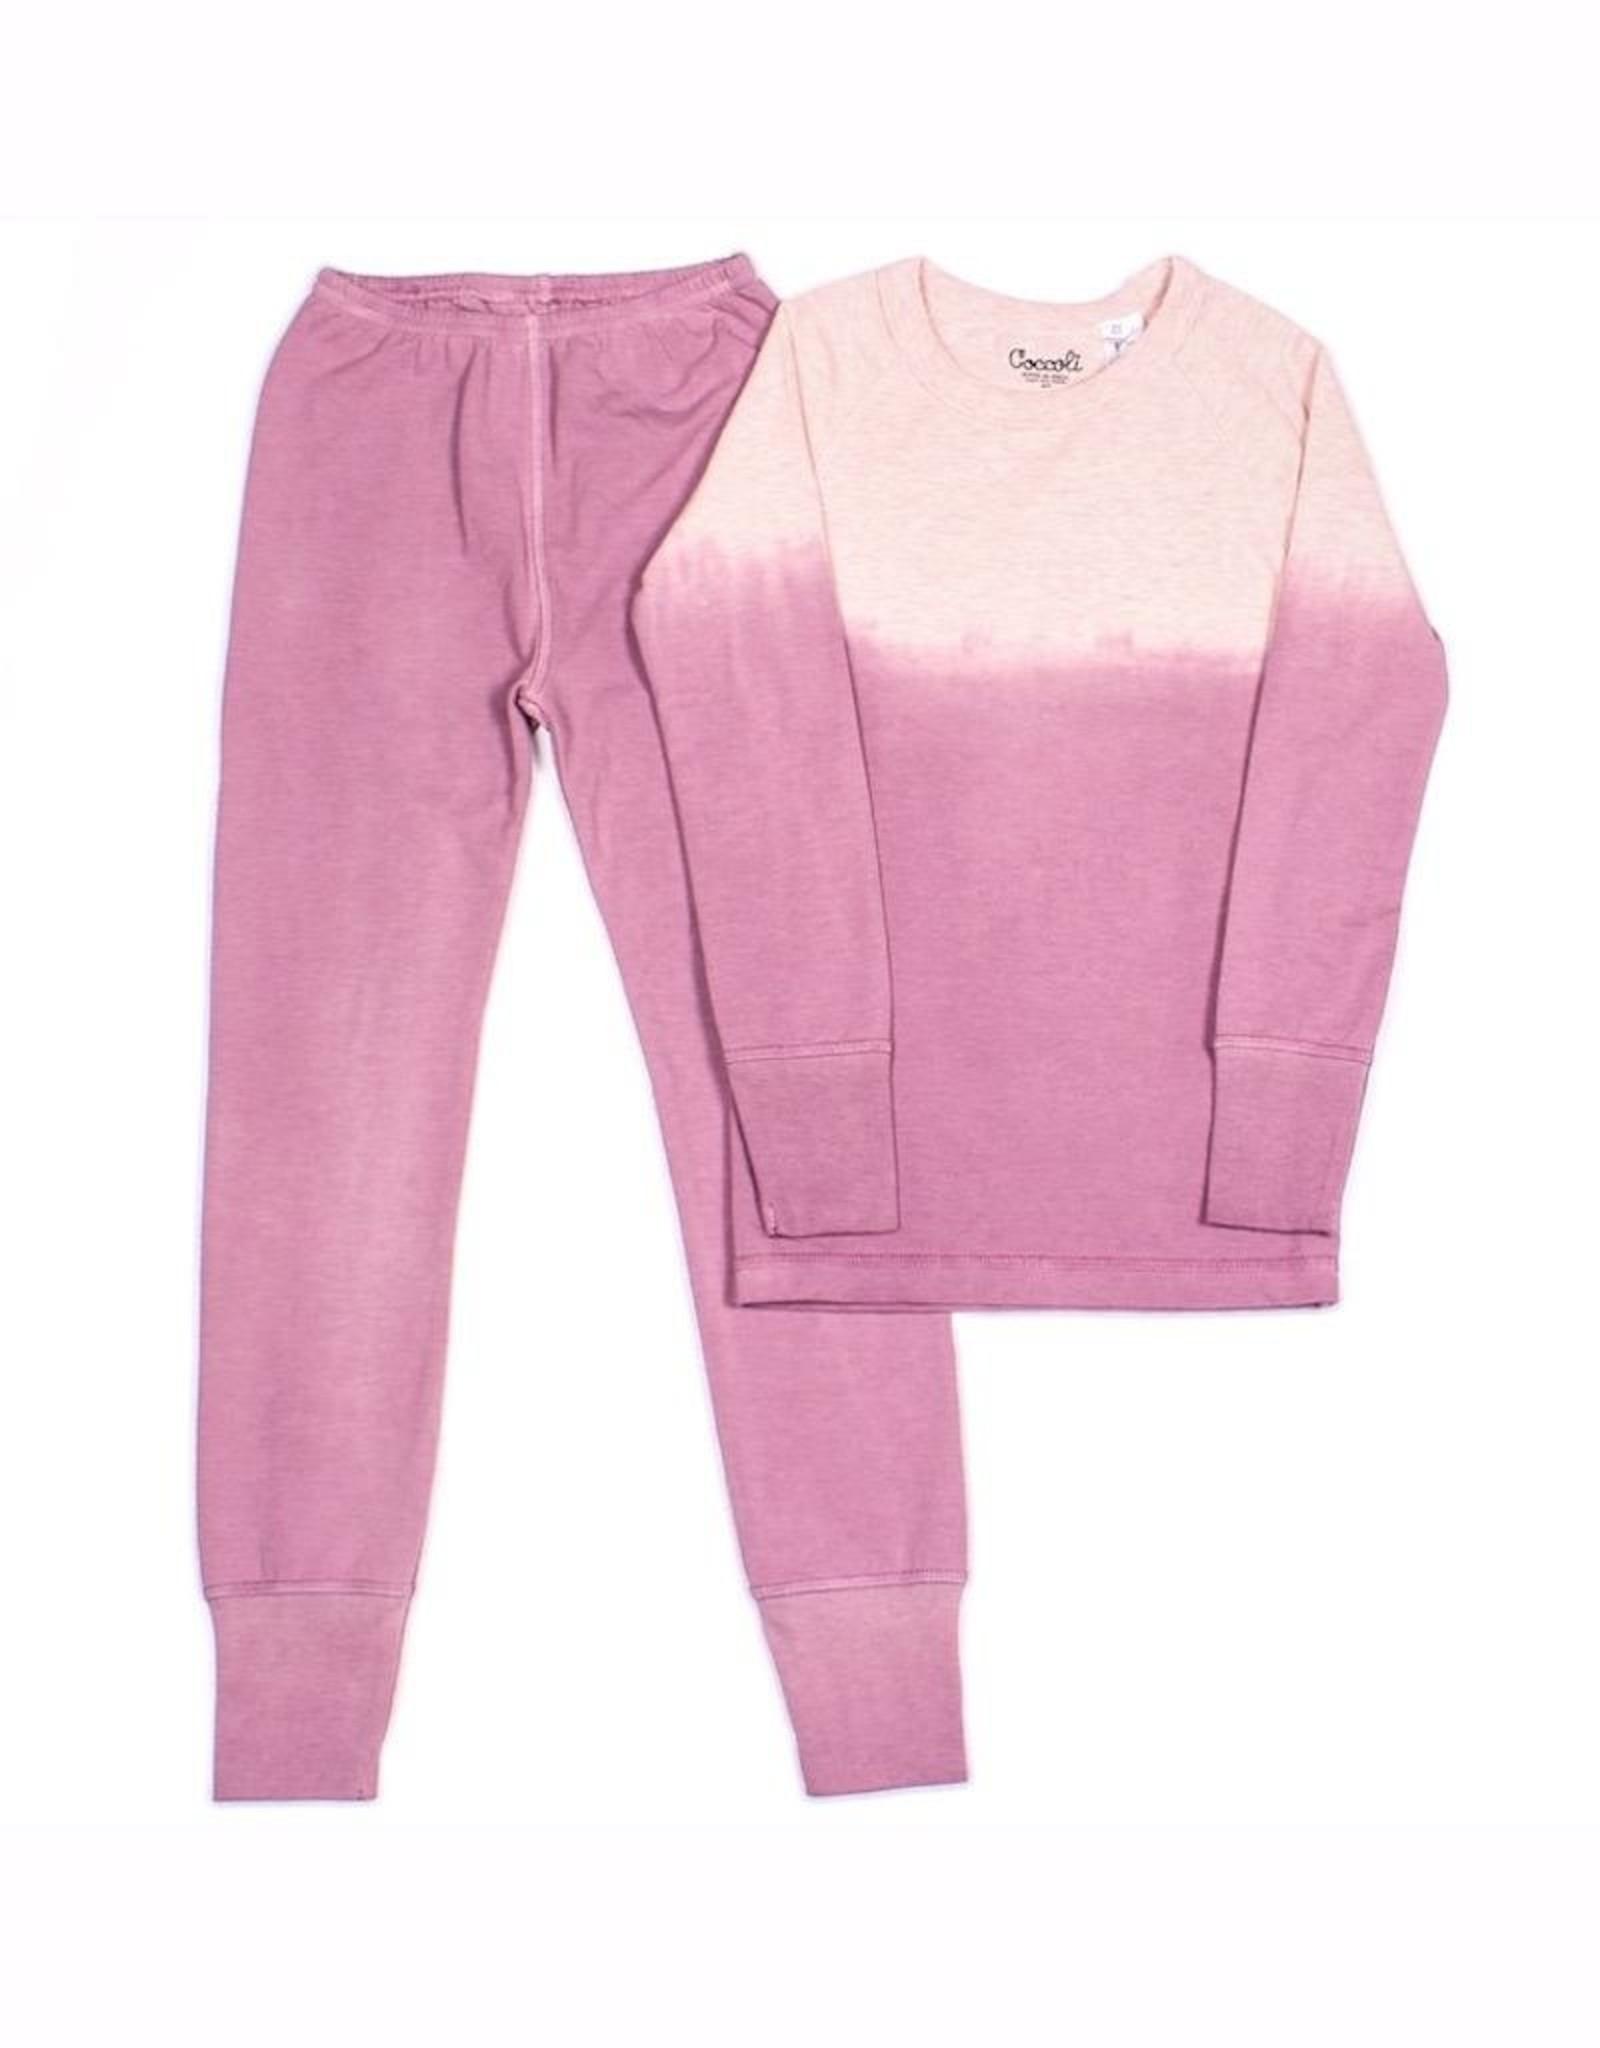 Pink Ombre Pajama Set